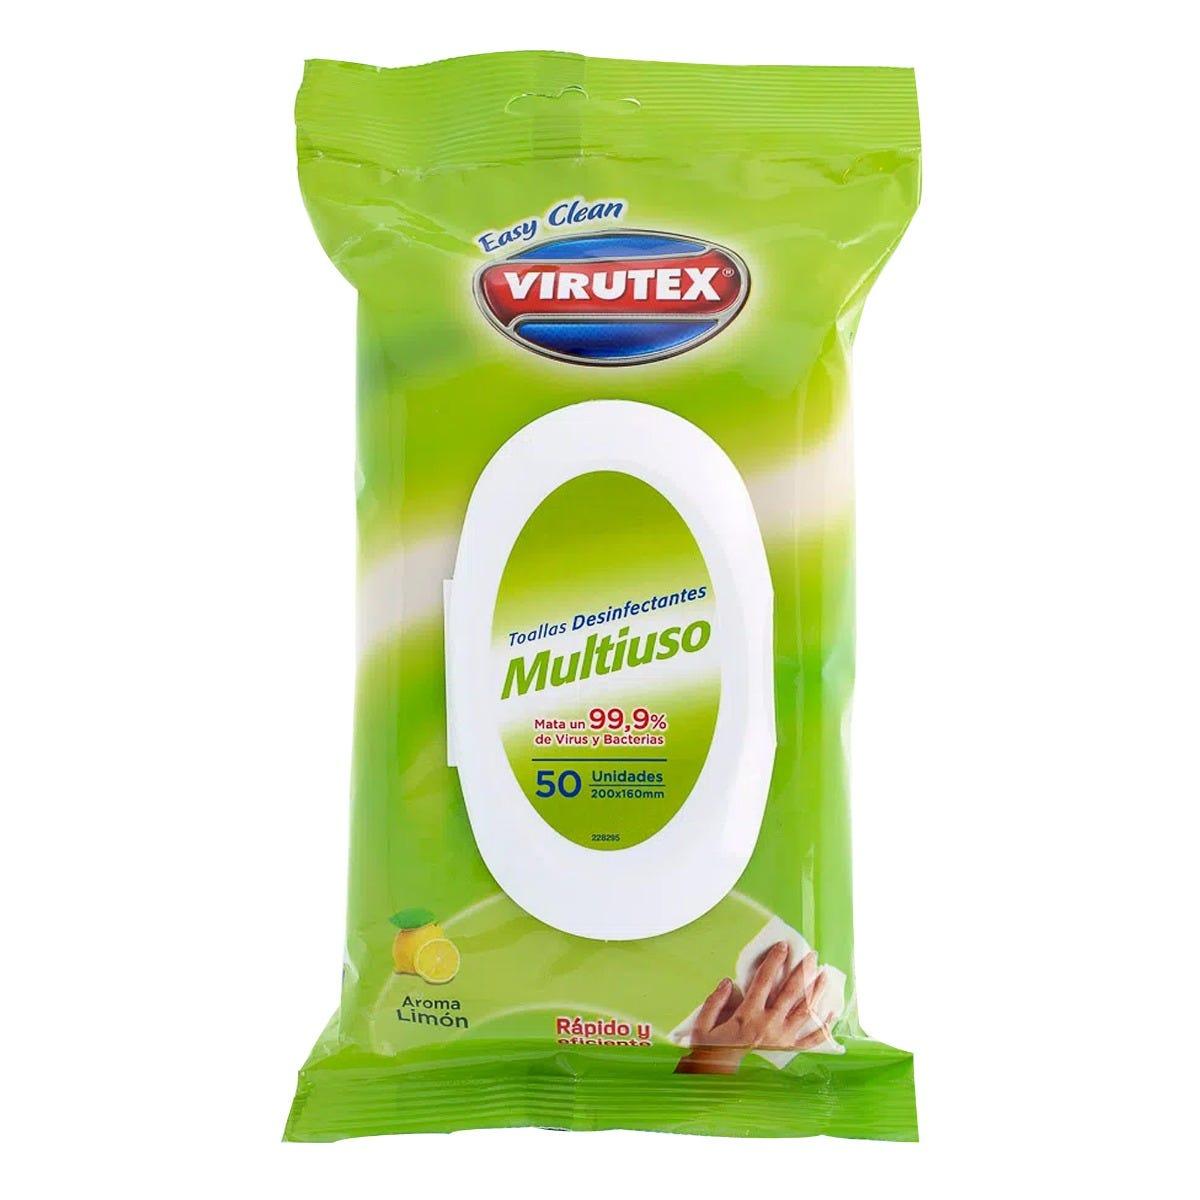 Toallas desinfectantes Virutex® Easy Clean, 50 Piezas